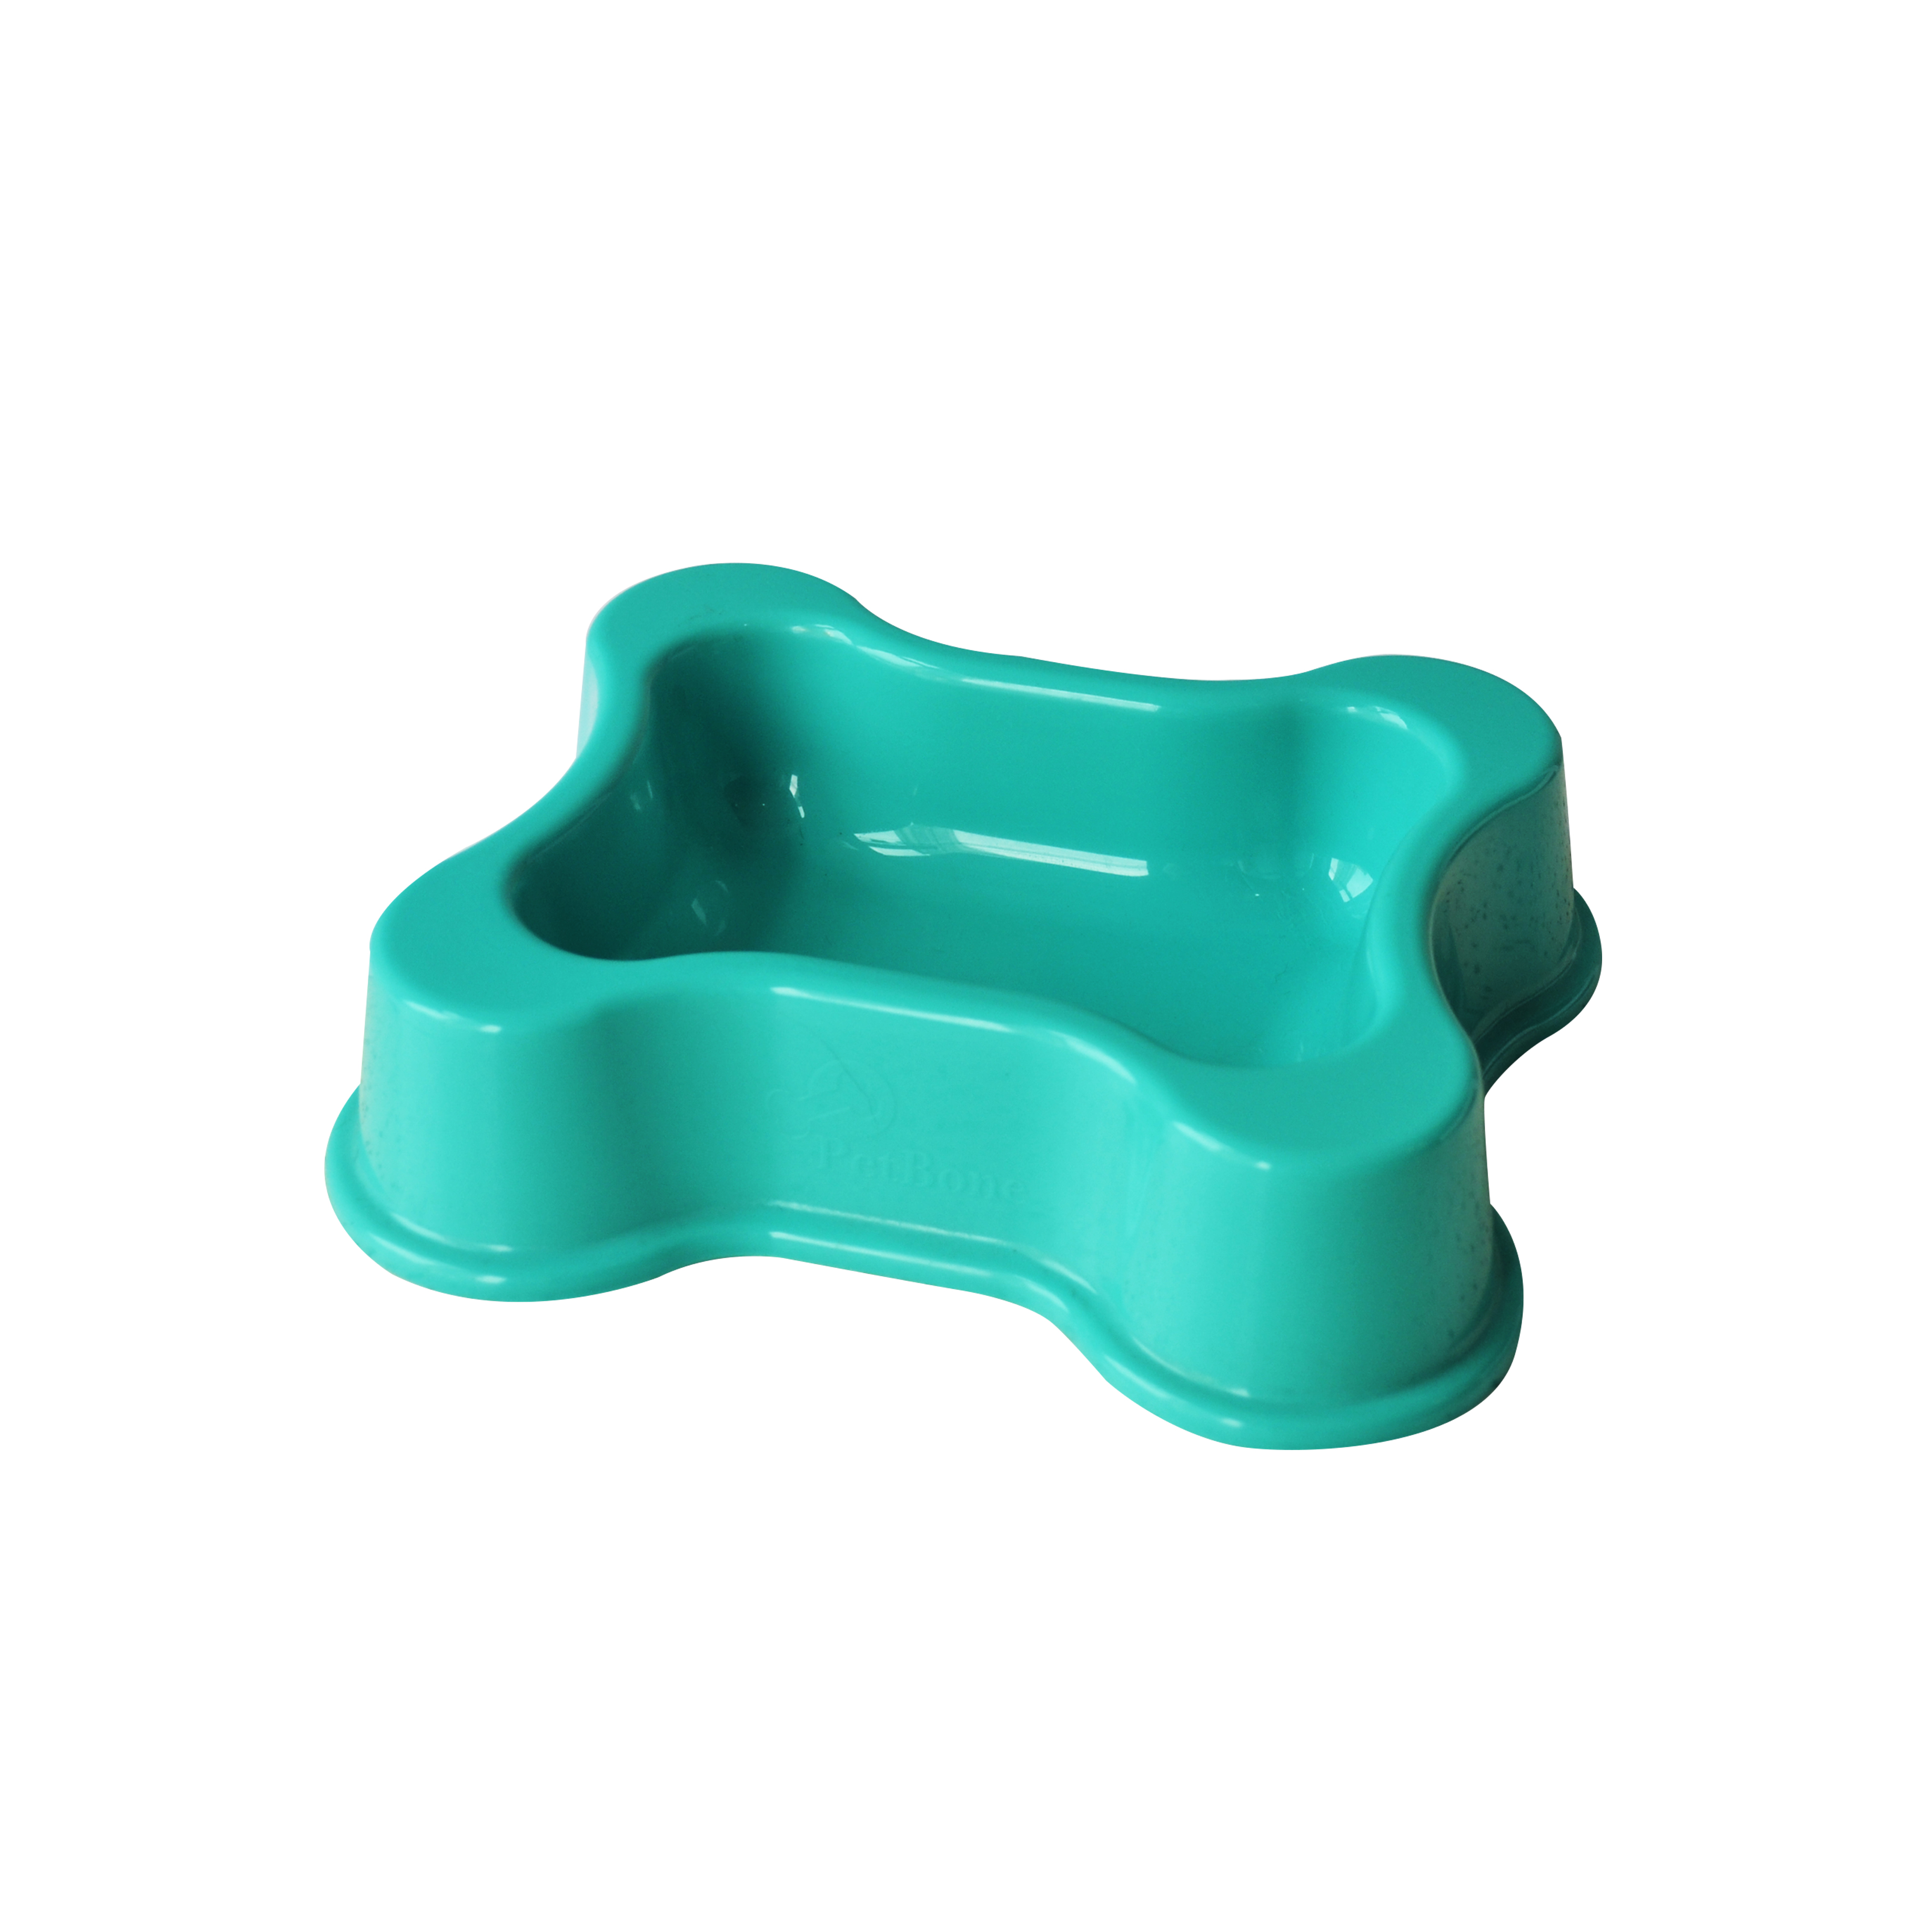 Comedouro ou bebedouro individual ocean green anti-formiga